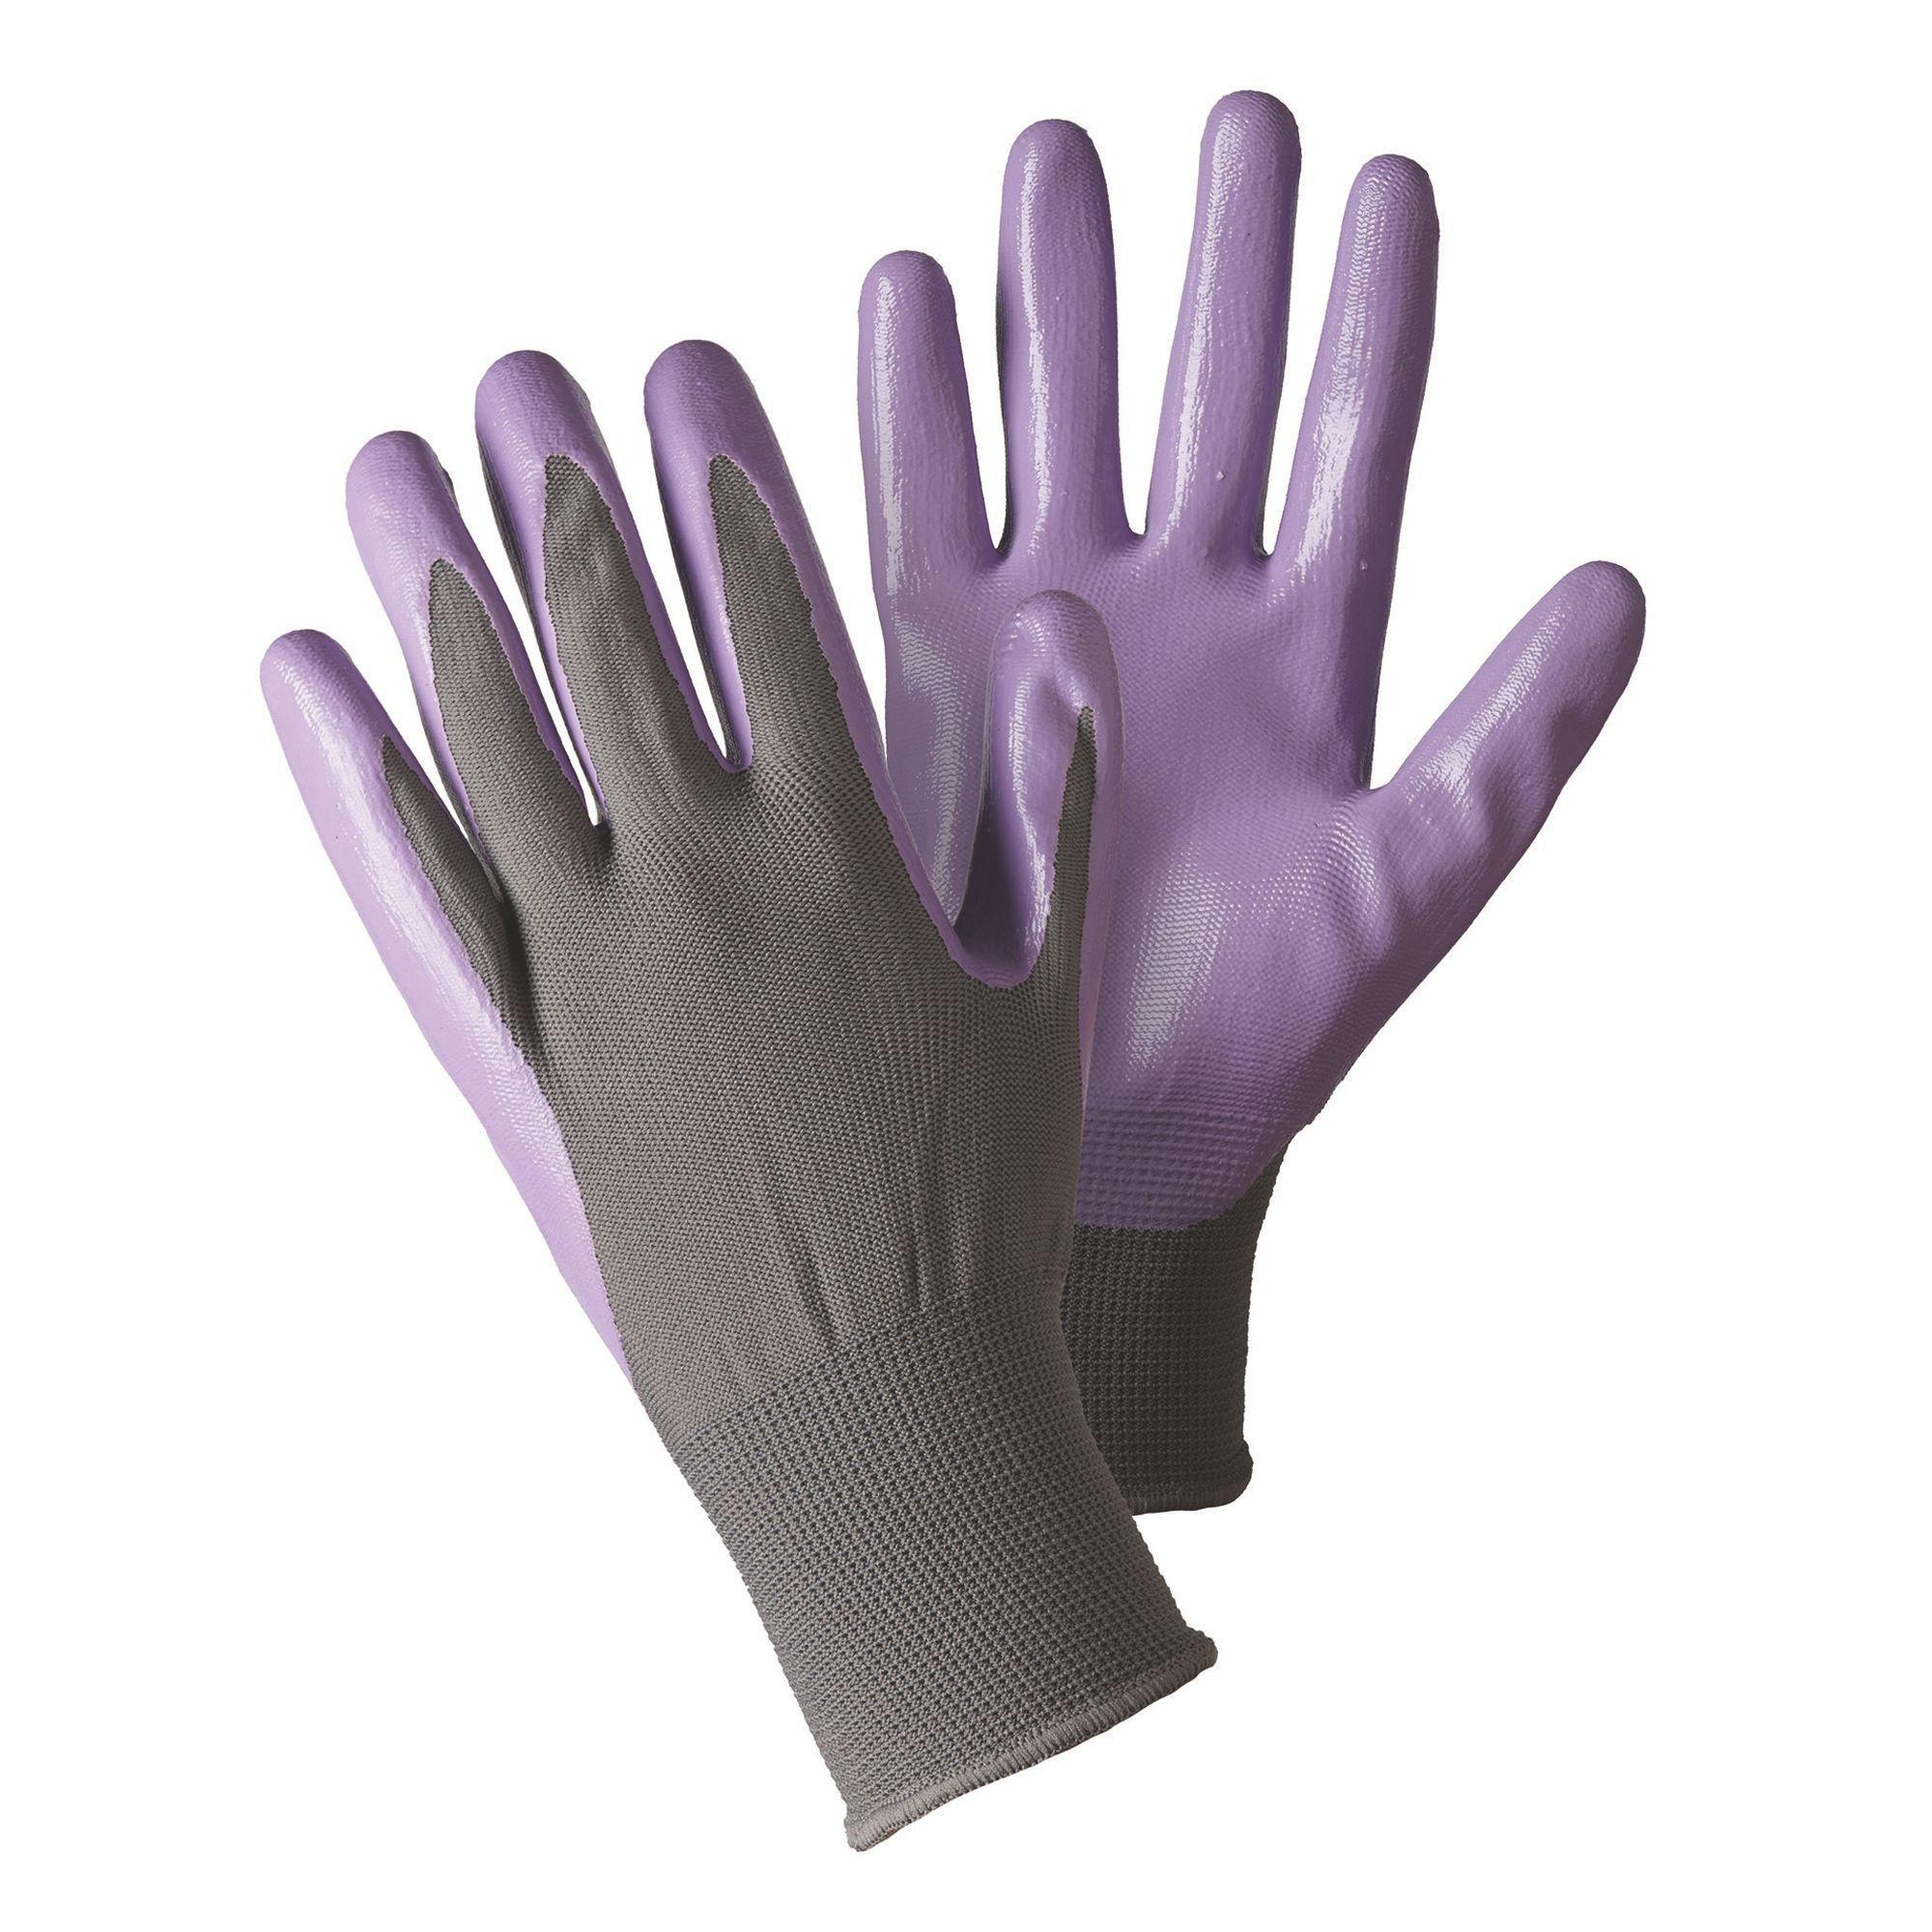 Image Result For Nitrate Gloves